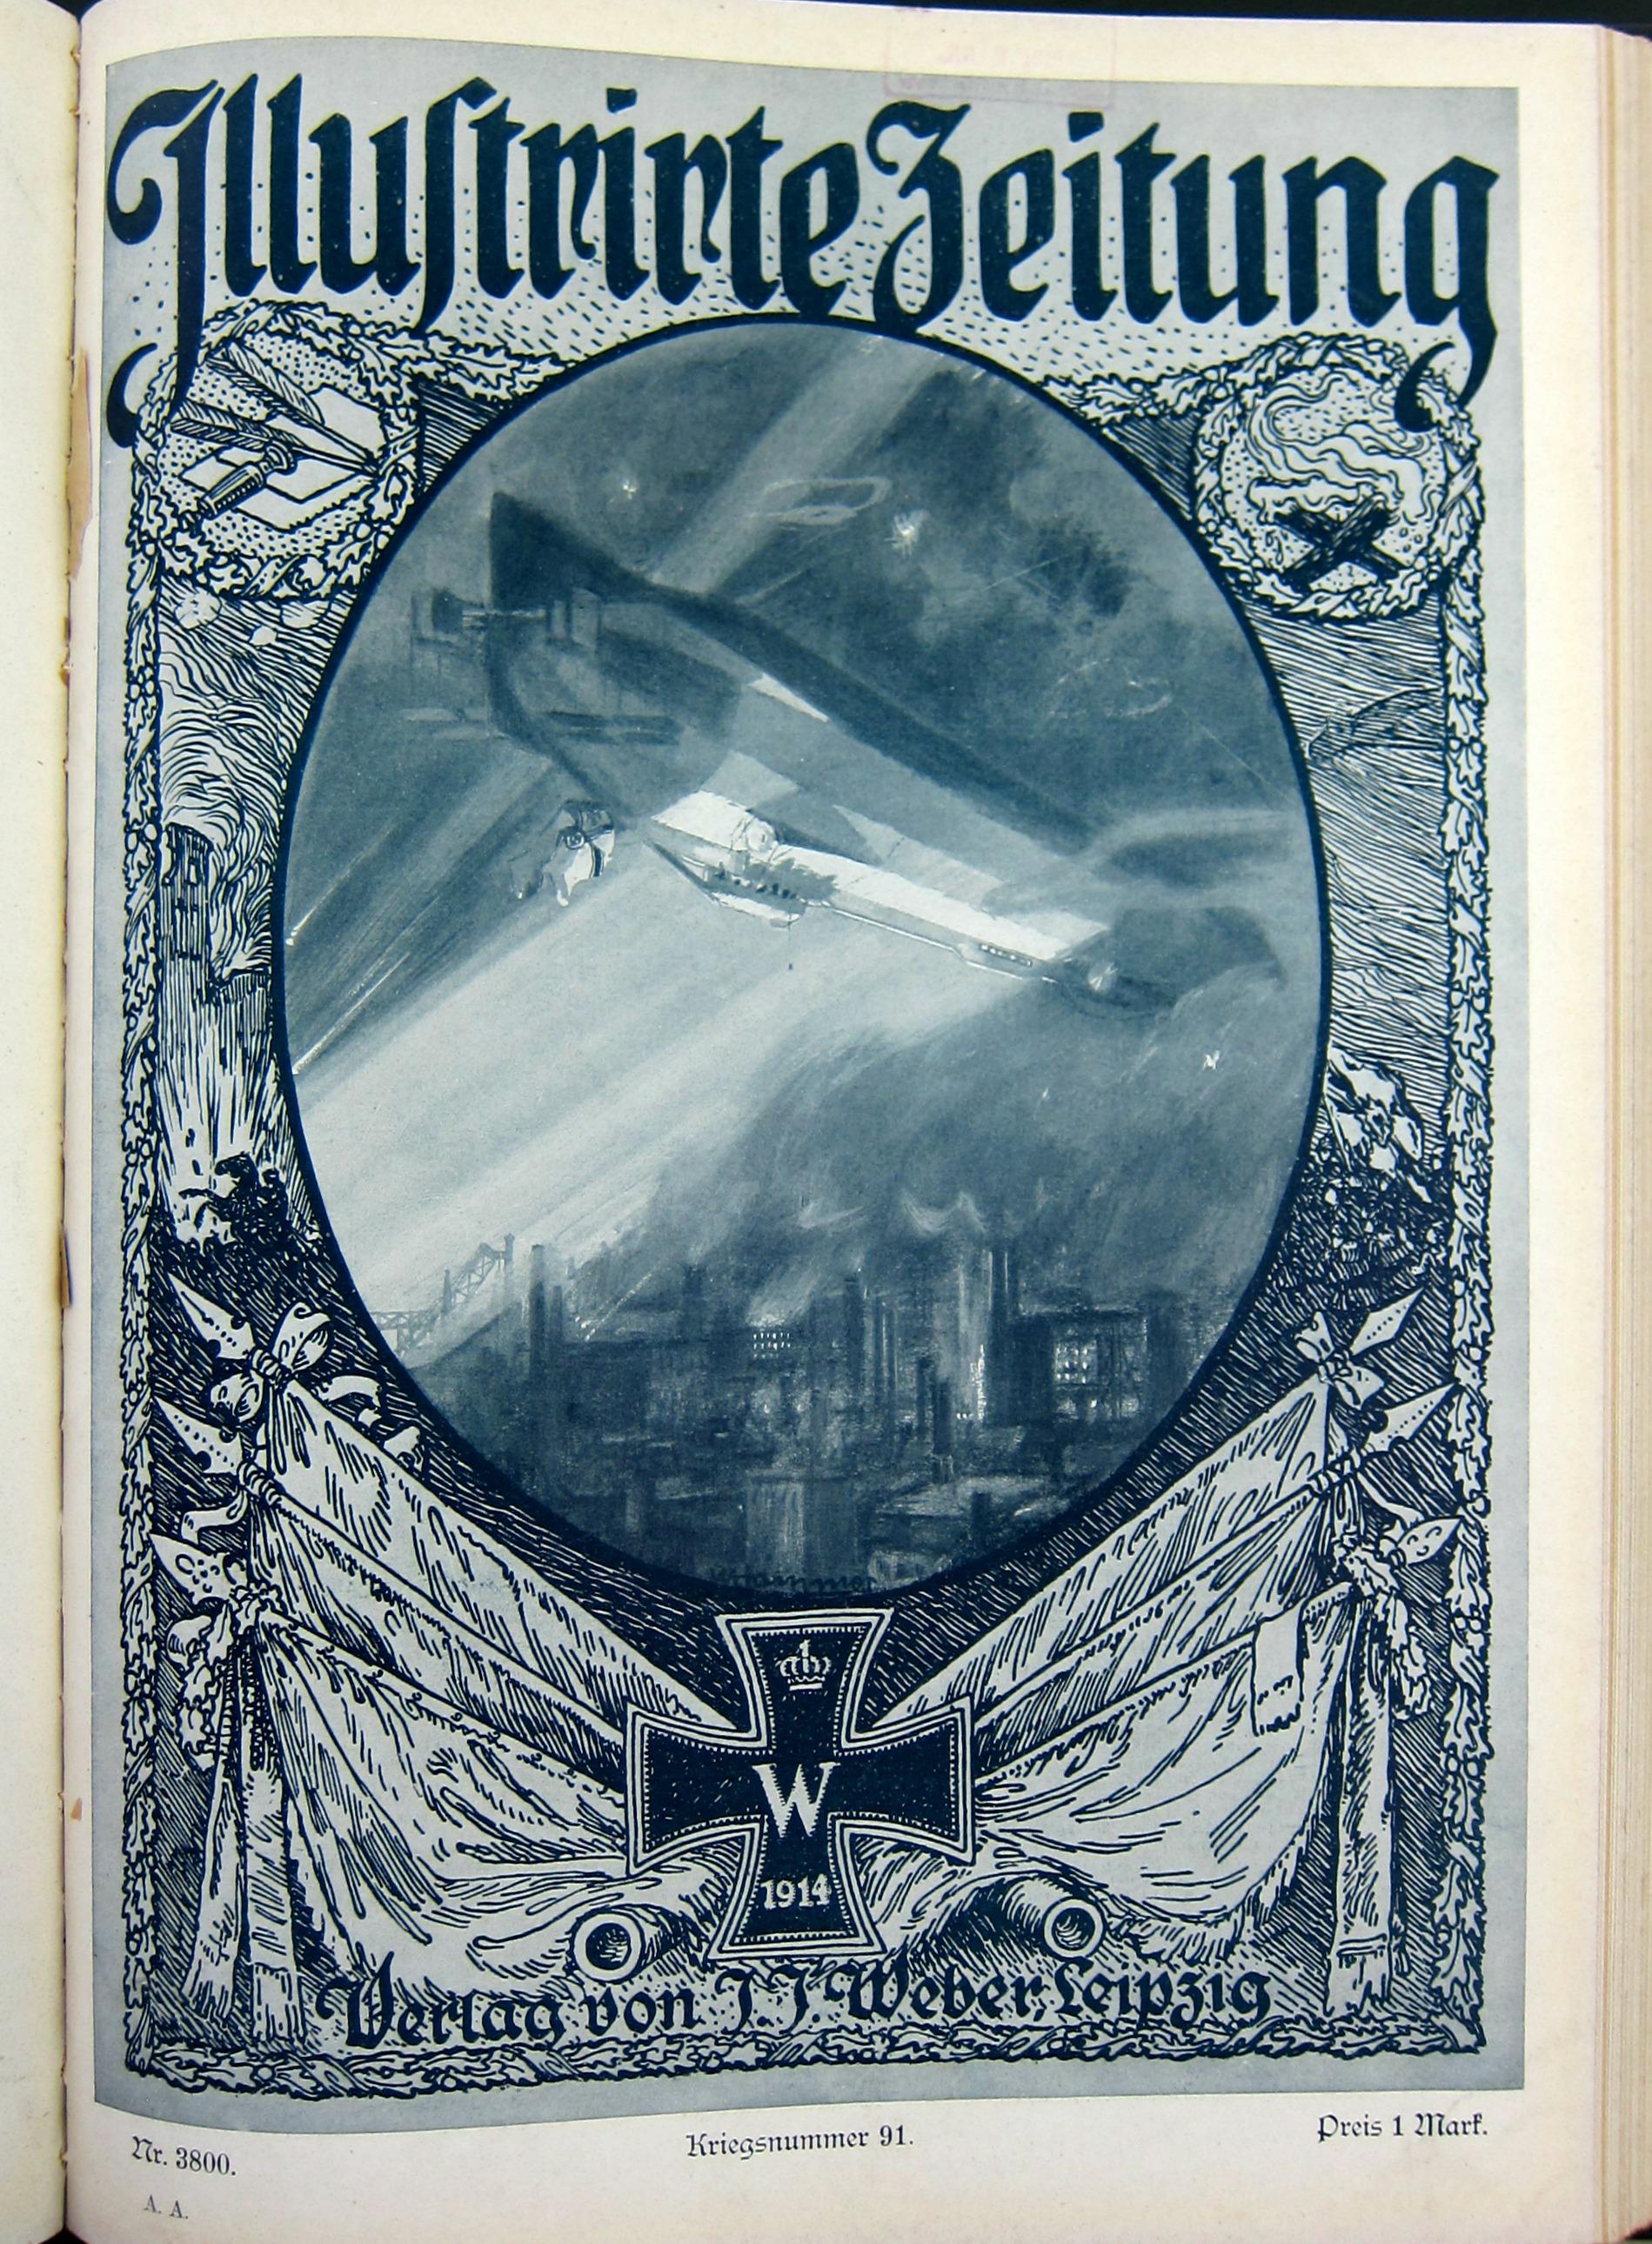 JF Ptak Science Books: Aviation & flight